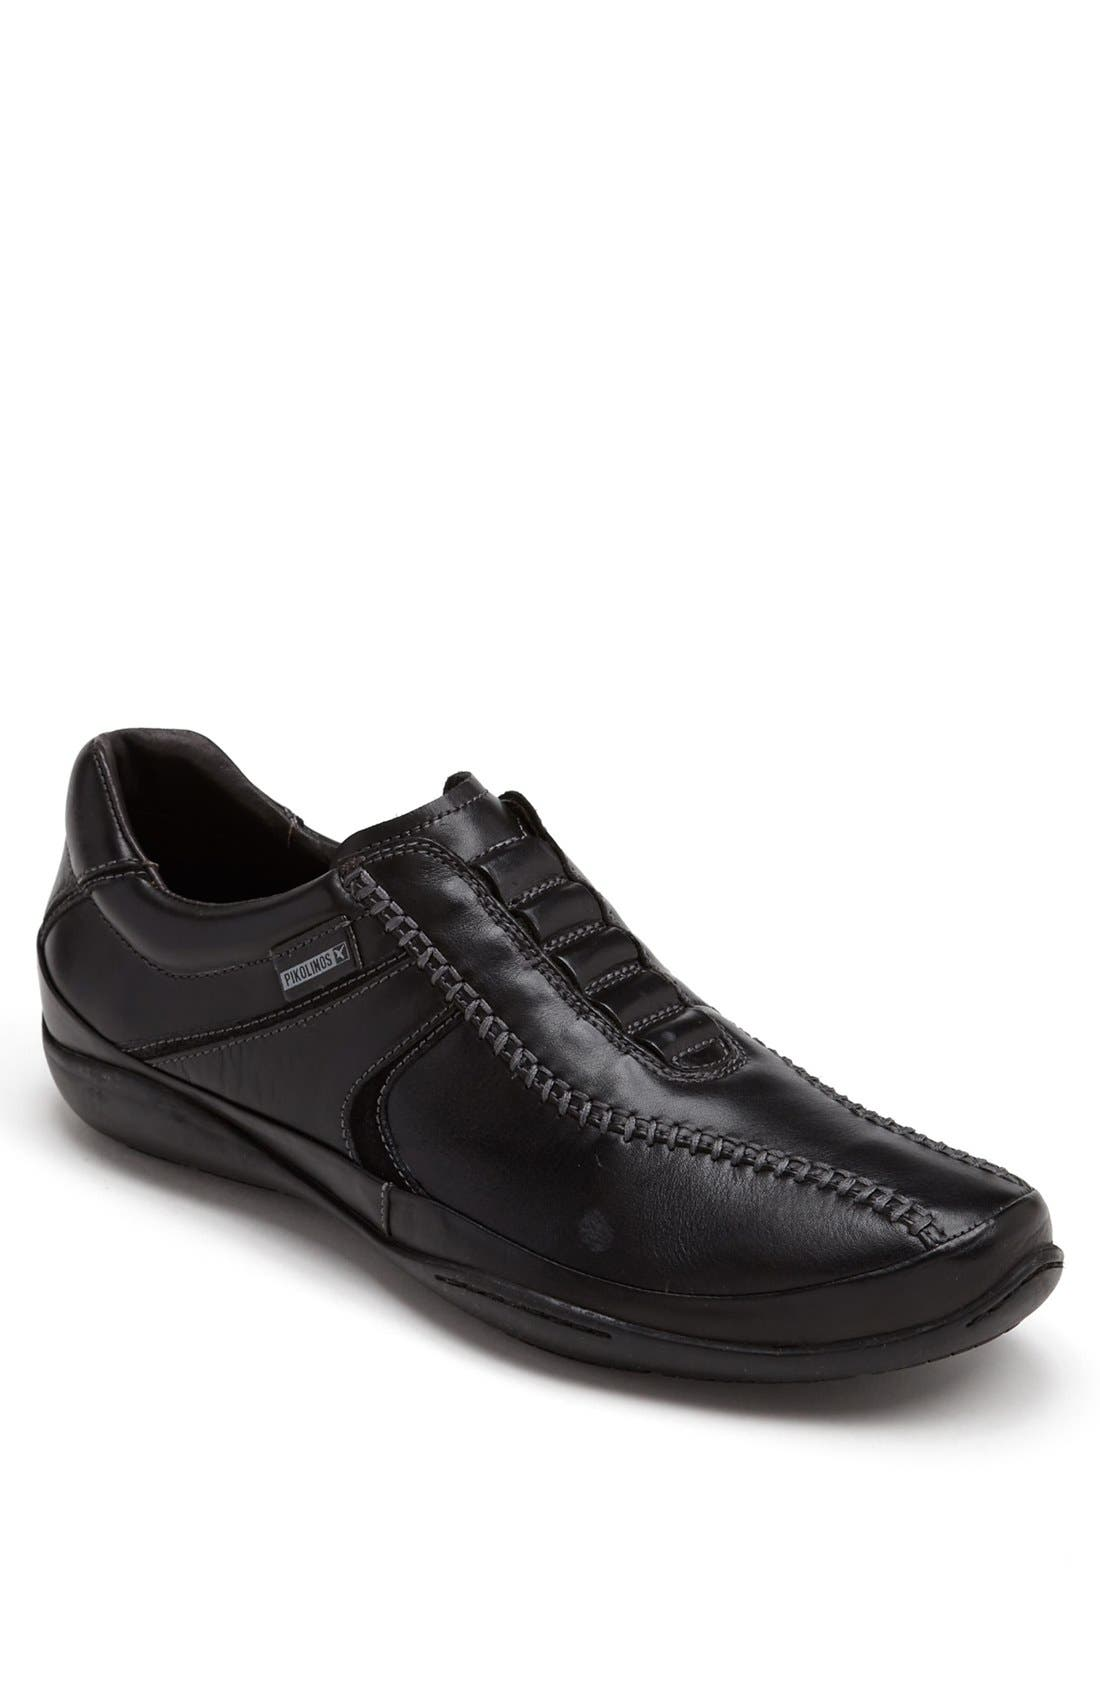 Alternate Image 1 Selected - PIKOLINOS 'Suecia' Sneaker